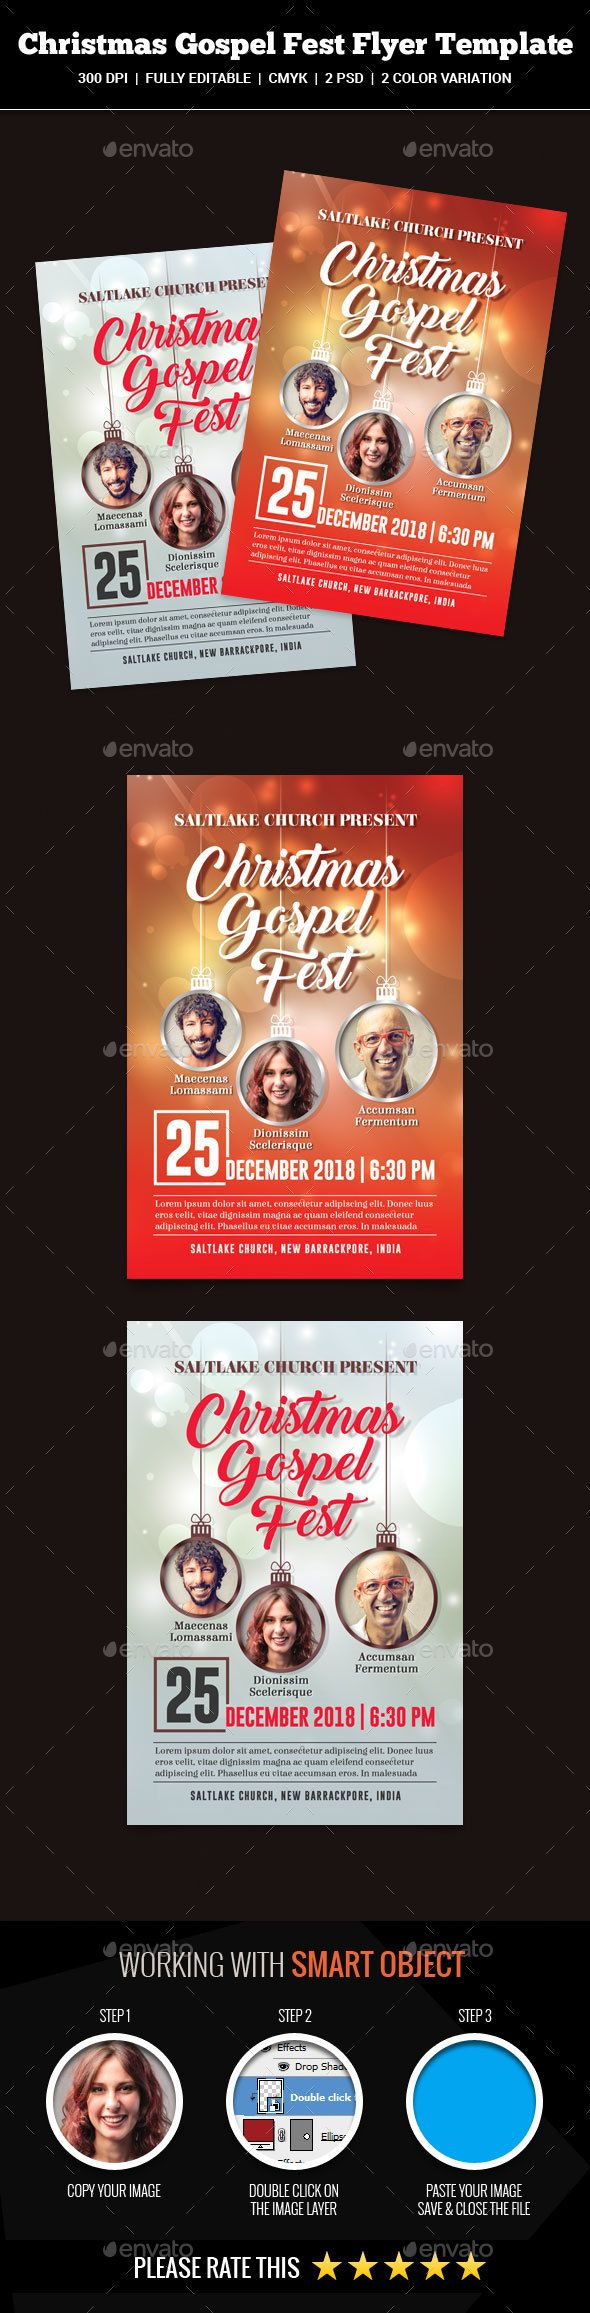 Christmas Gospel Fest Flyer Template Psd  Christmas Flyer